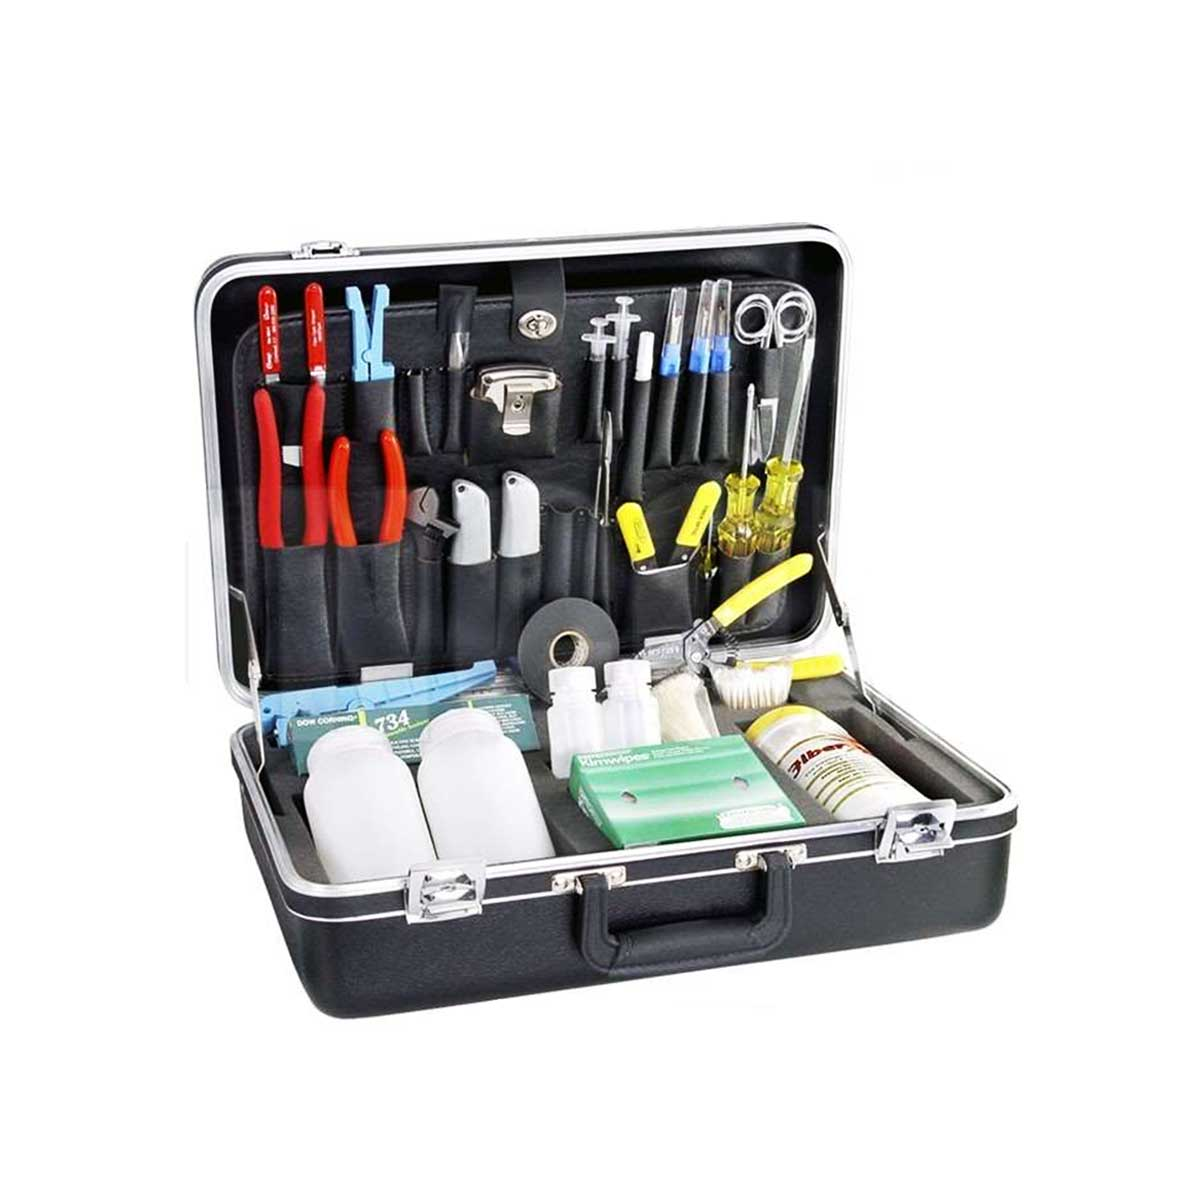 Kit de herramientas de empalme por fusión CORNING M67-003